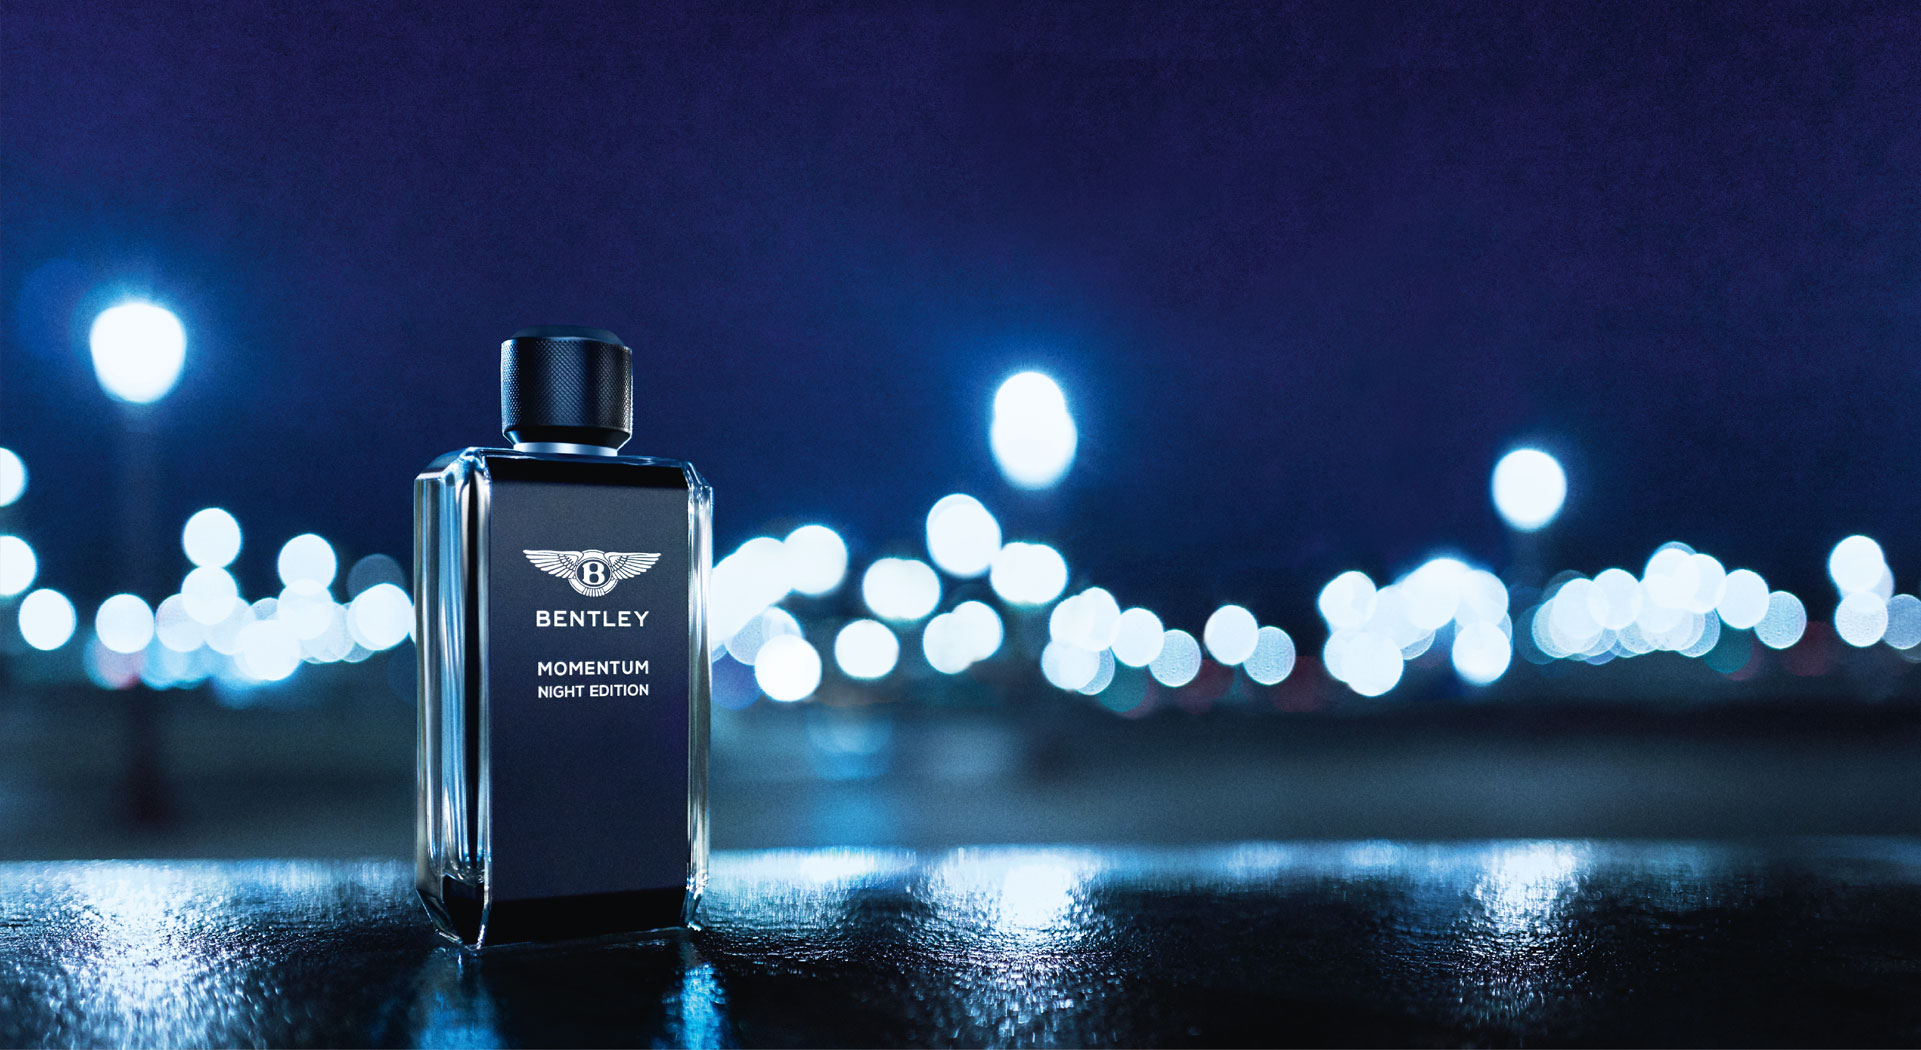 Fragrances Night Momentum Fragrances Night Momentum Momentum EditionBentley EditionBentley W2IYED9H